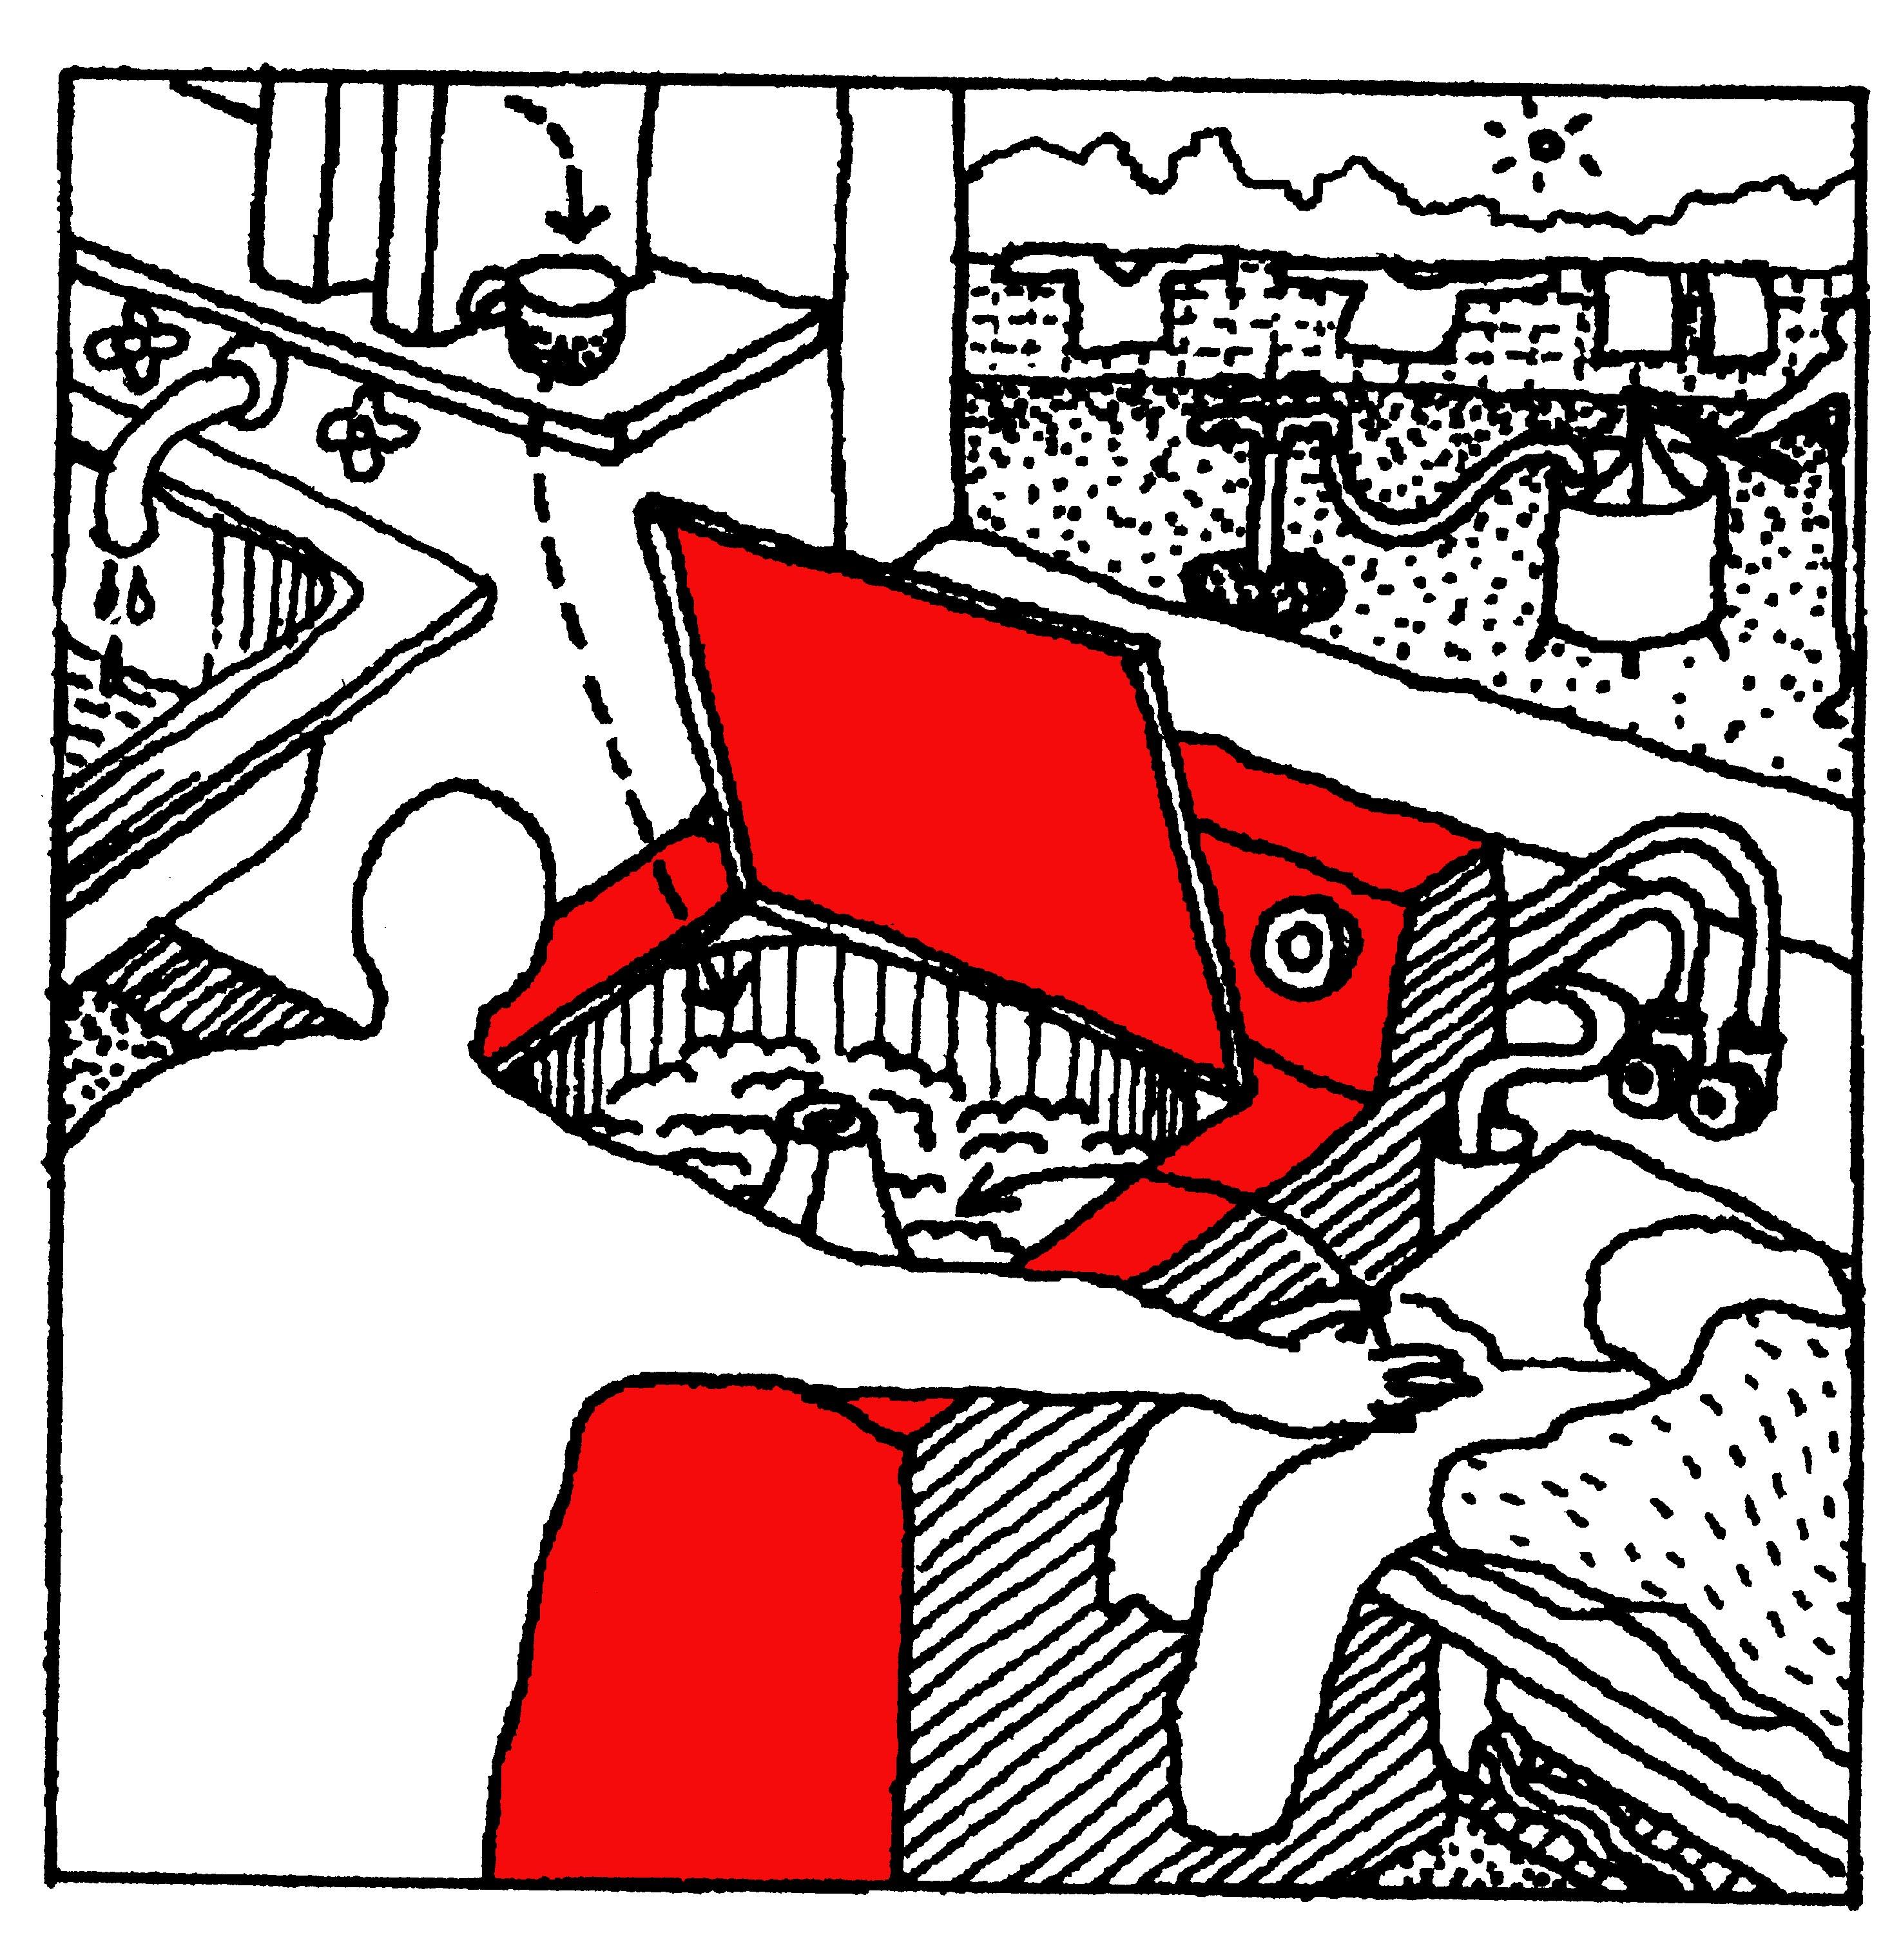 The washing machine debate